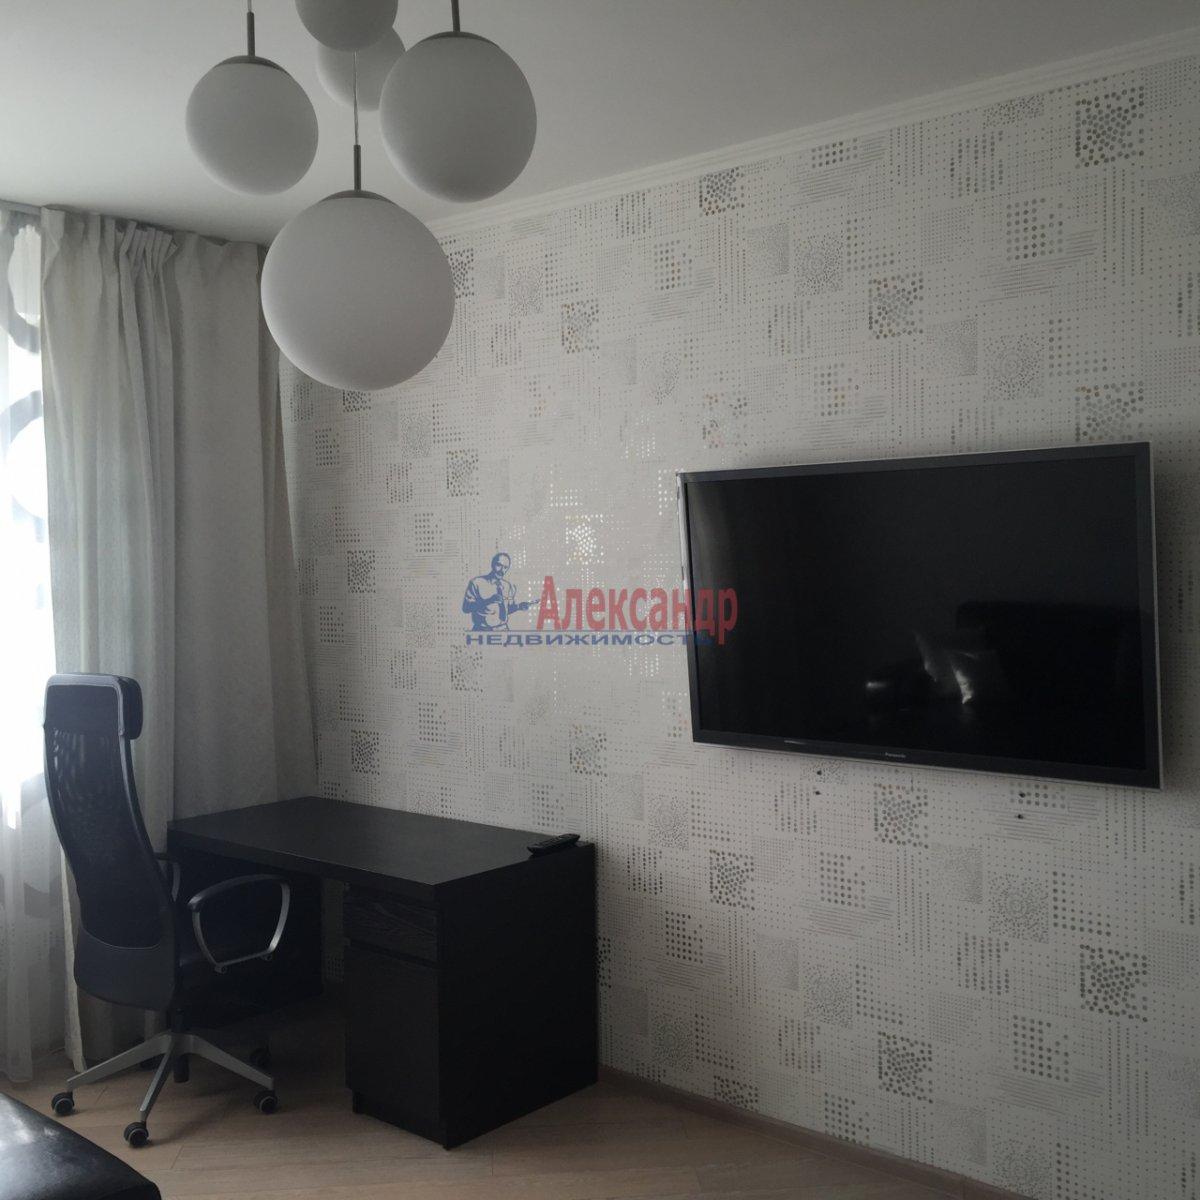 2-комнатная квартира (64м2) в аренду по адресу Белы Куна ул., 1— фото 6 из 9